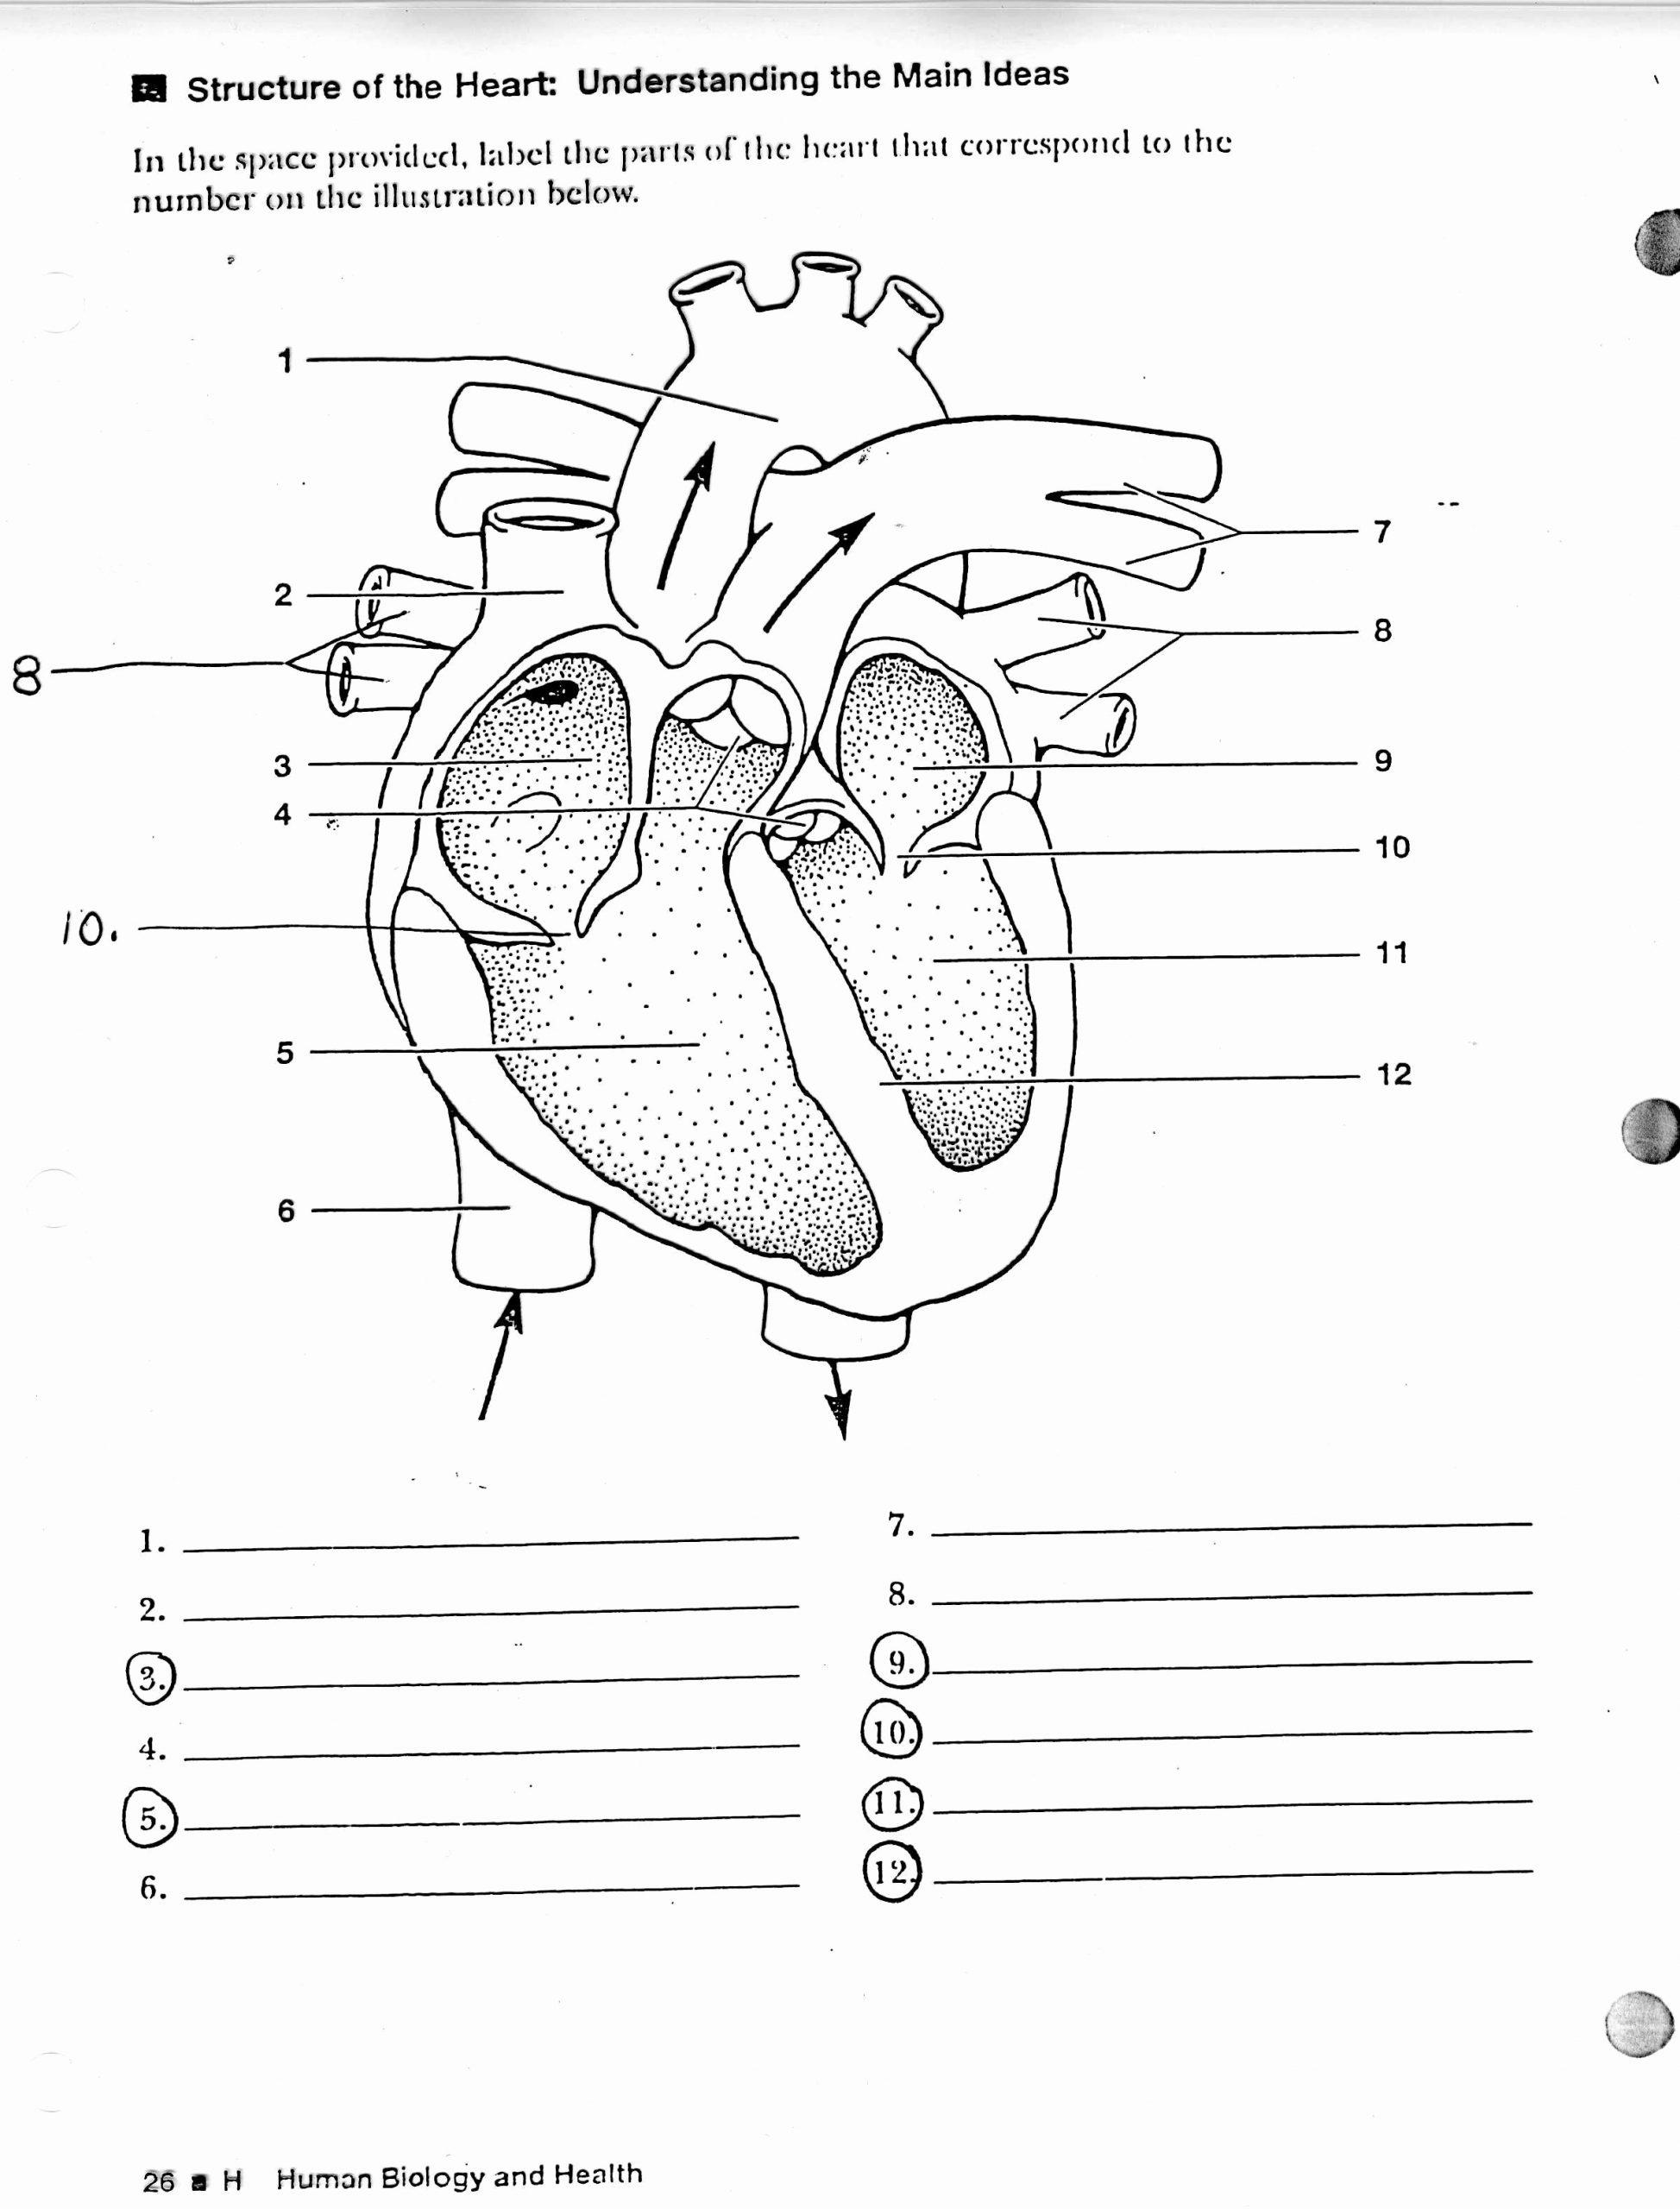 Heart Diagram Worksheet Blank Fresh Account Suspended